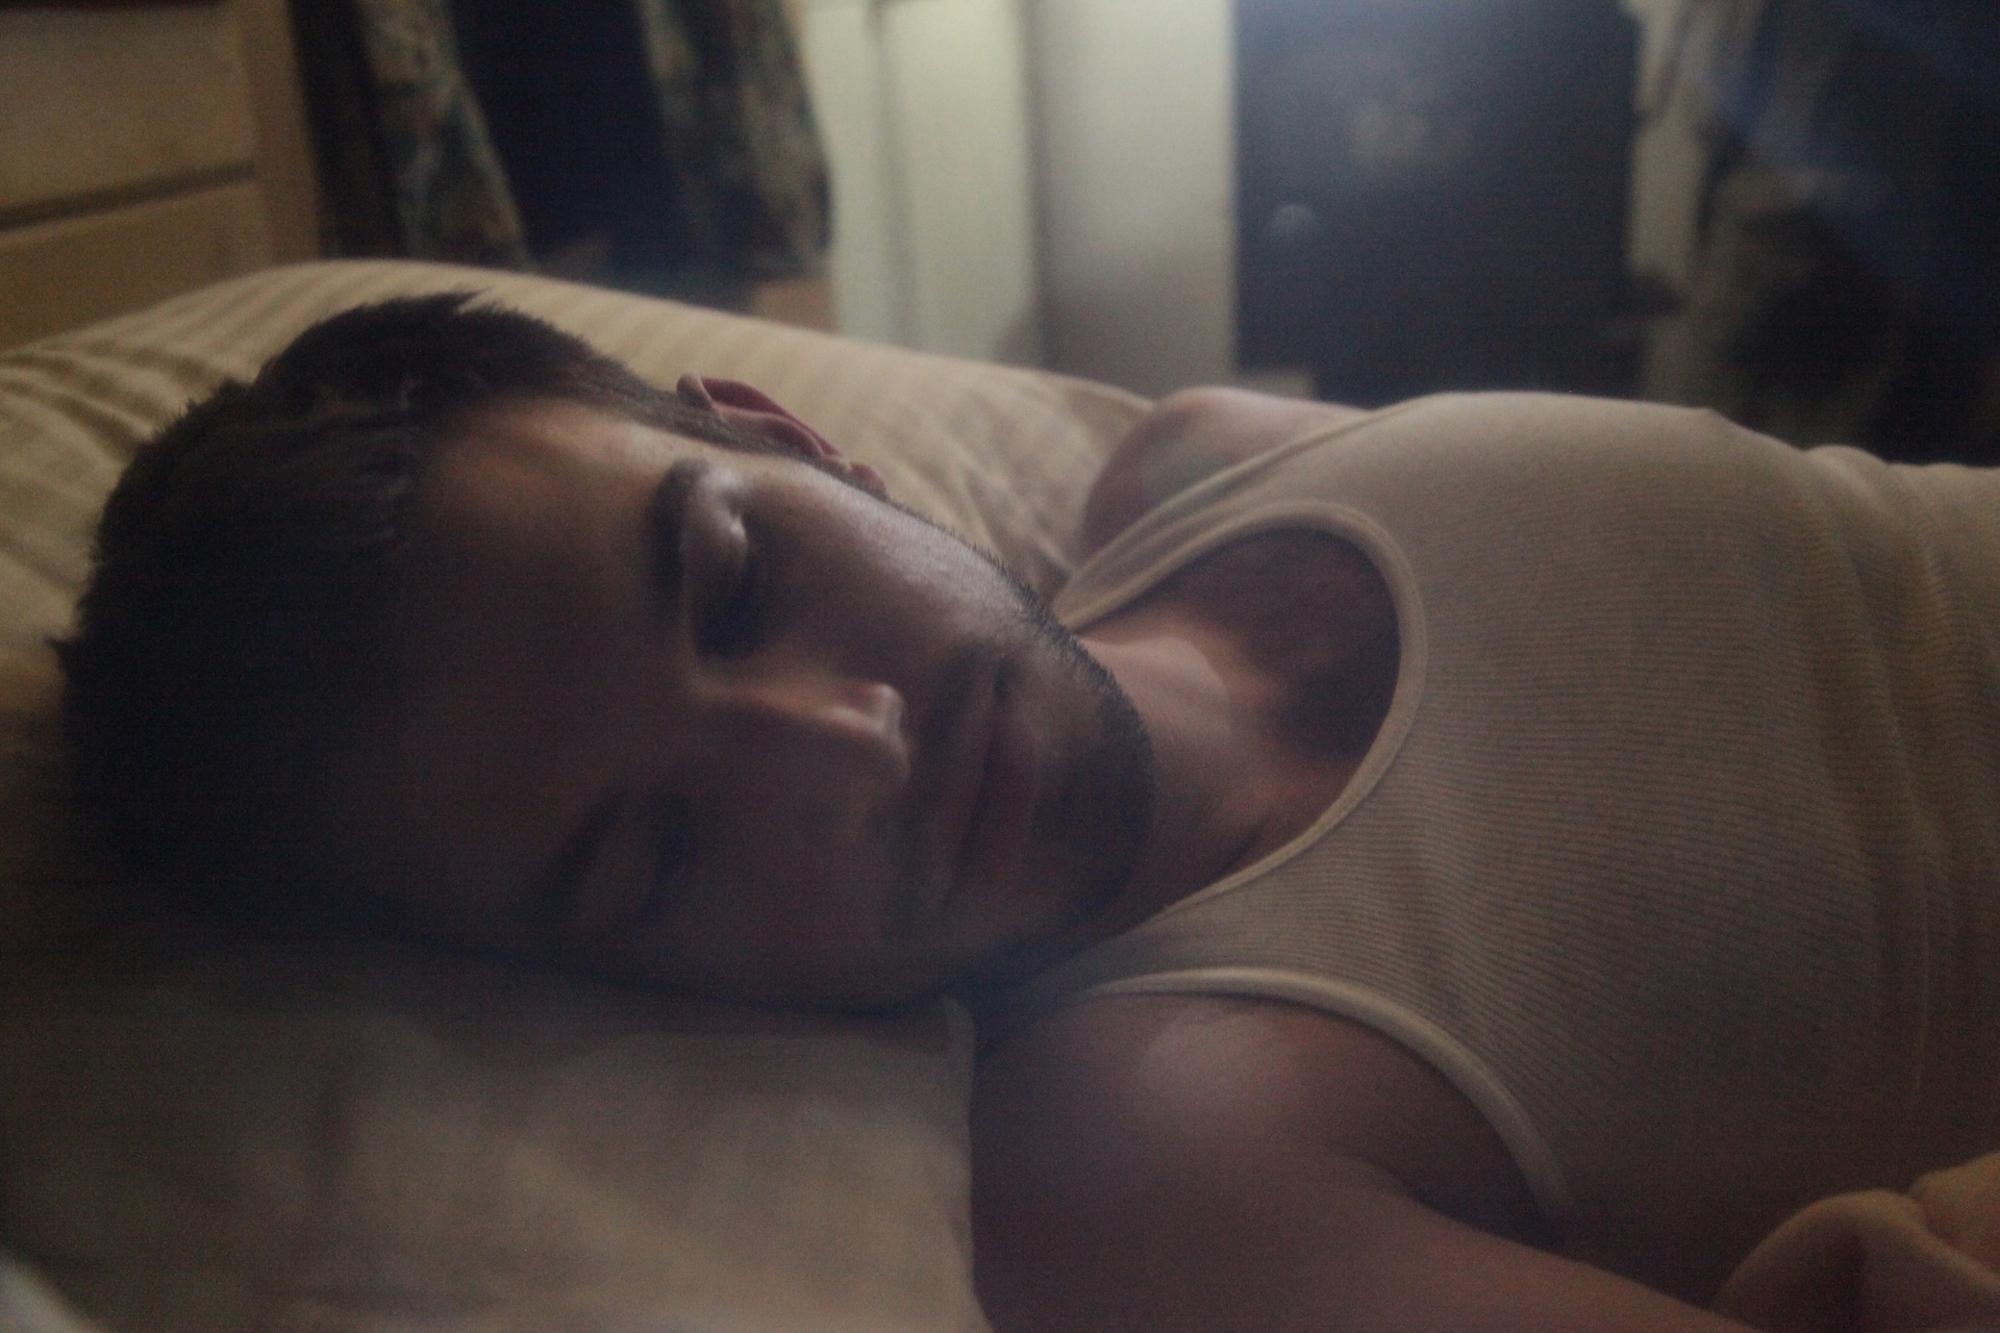 Vasilios Asimakos behind the scenes for Geena Matuson's (@geenamatuson) experimental psychological thriller 'My Big Bad Wolf' (2013).